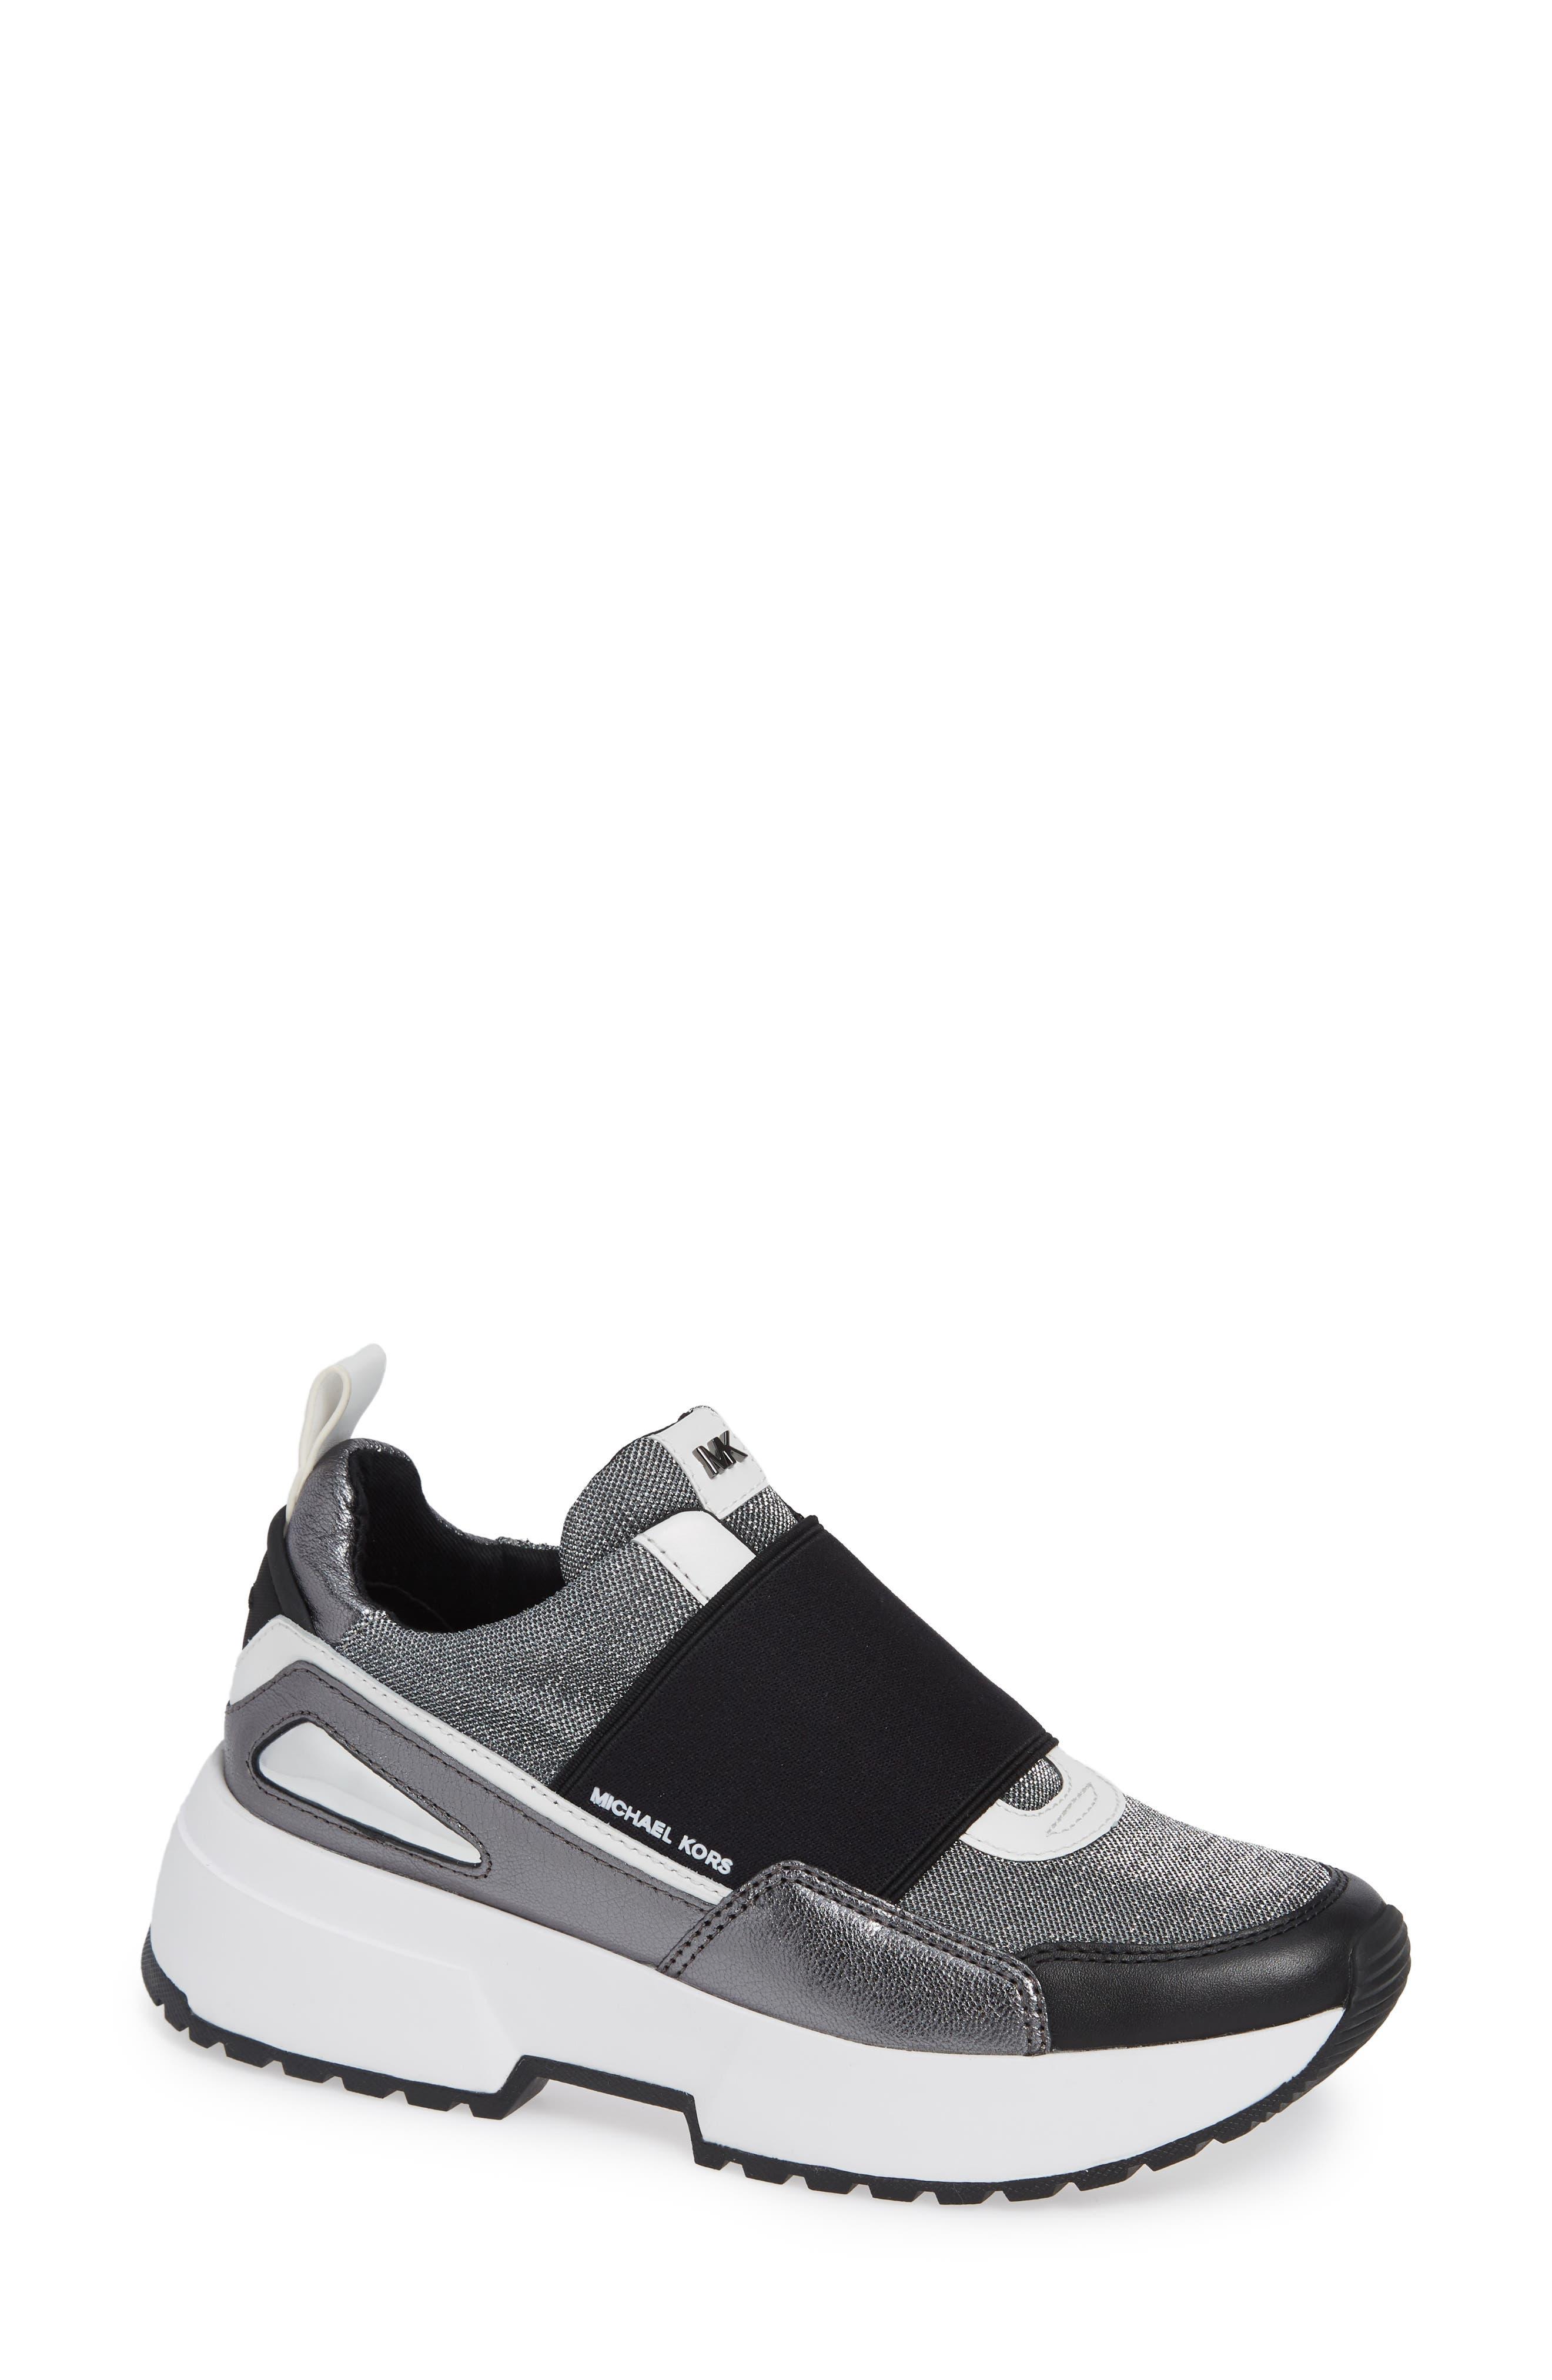 Cosmo Sneaker,                             Main thumbnail 1, color,                             SILVER METALLIC MULTI